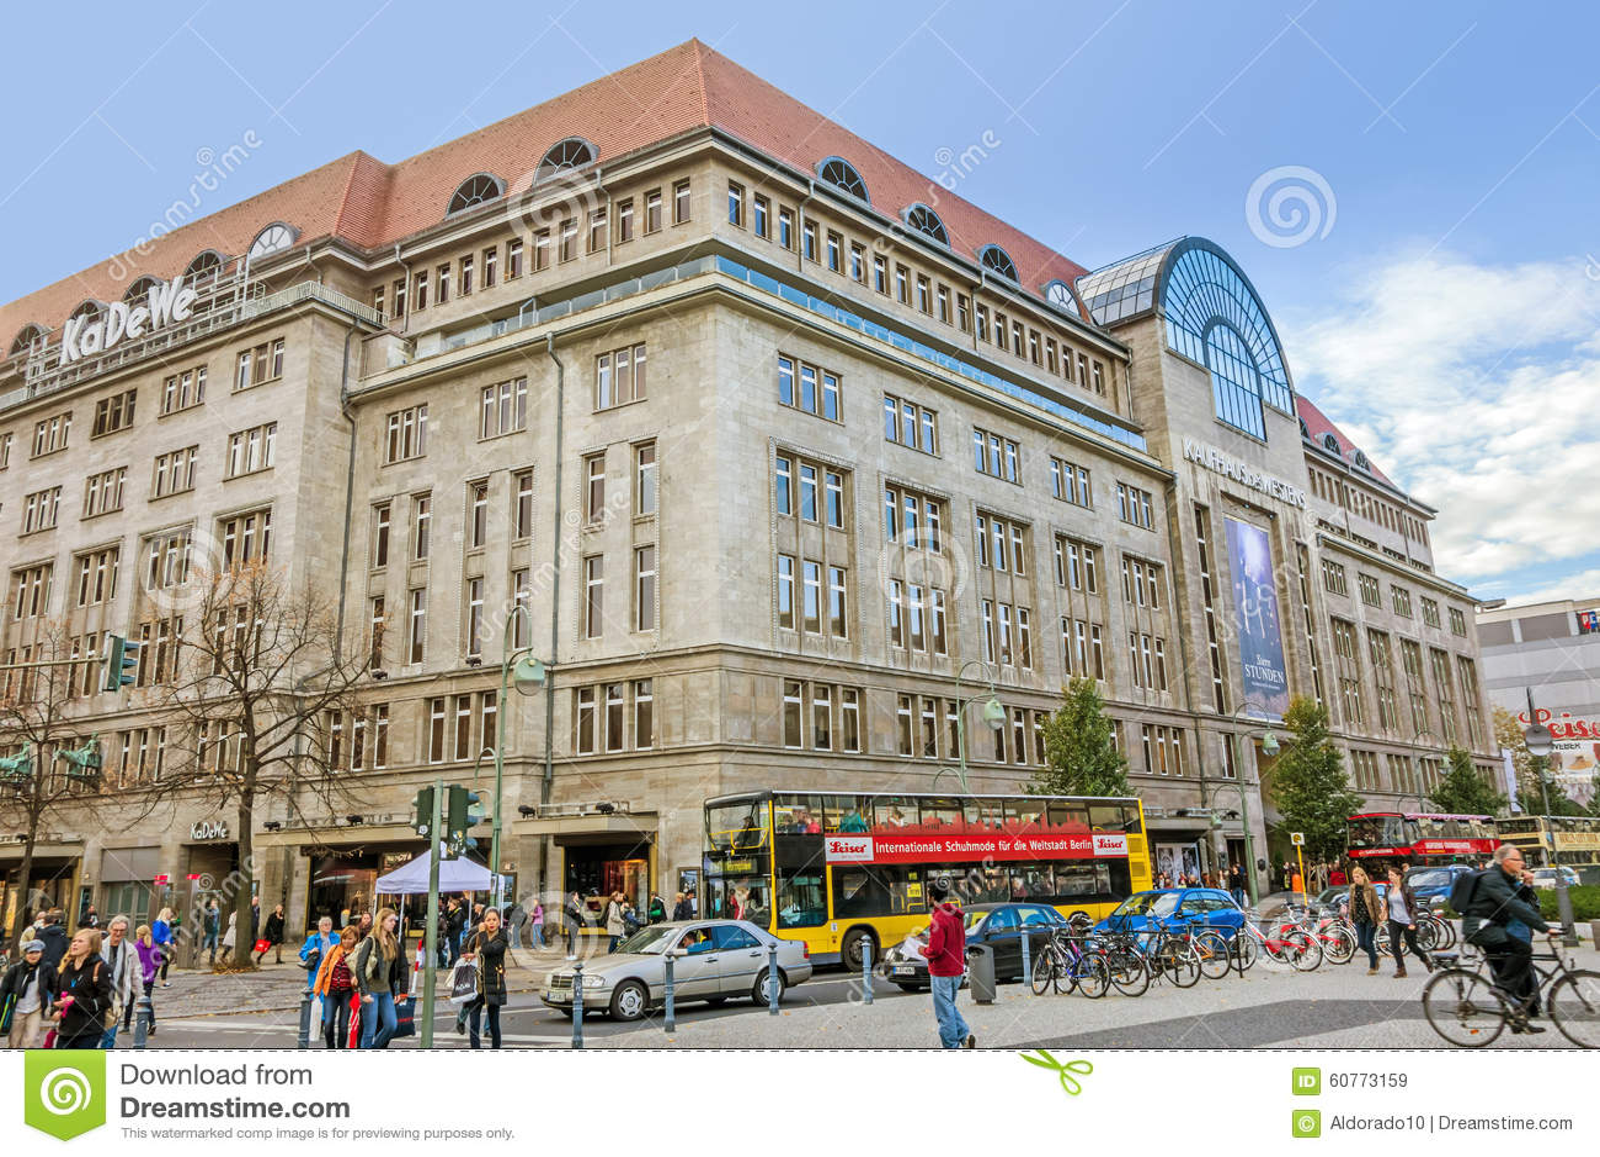 shopping mall kadewe kaufhaus des westens berlin. Black Bedroom Furniture Sets. Home Design Ideas